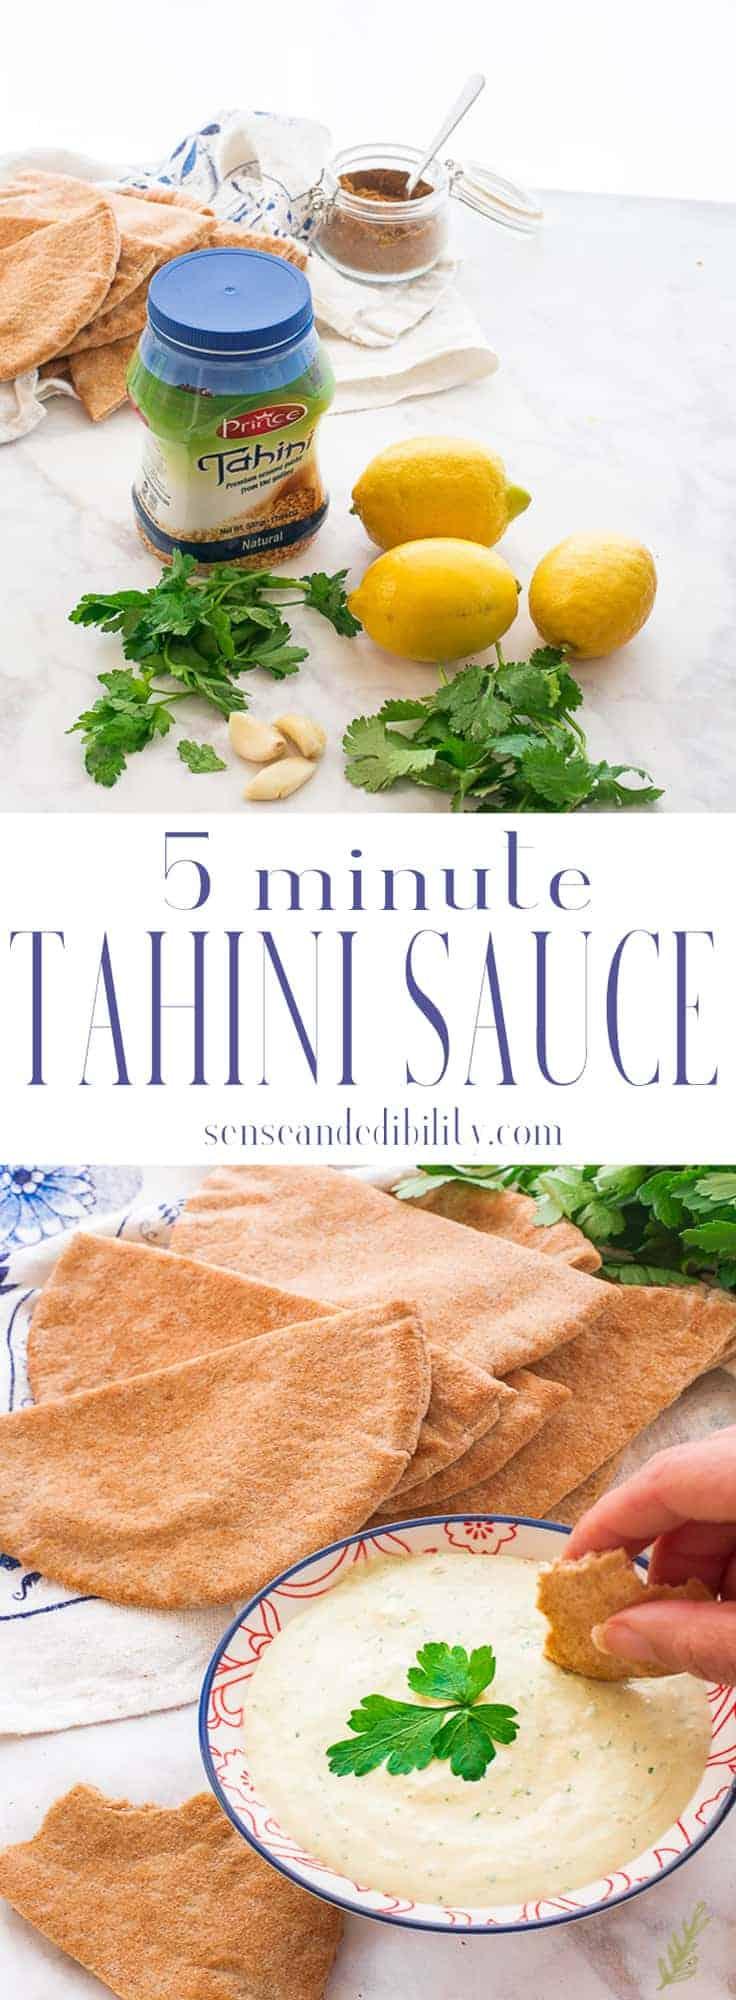 Sense & Edibility's Tahini Sauce Pin